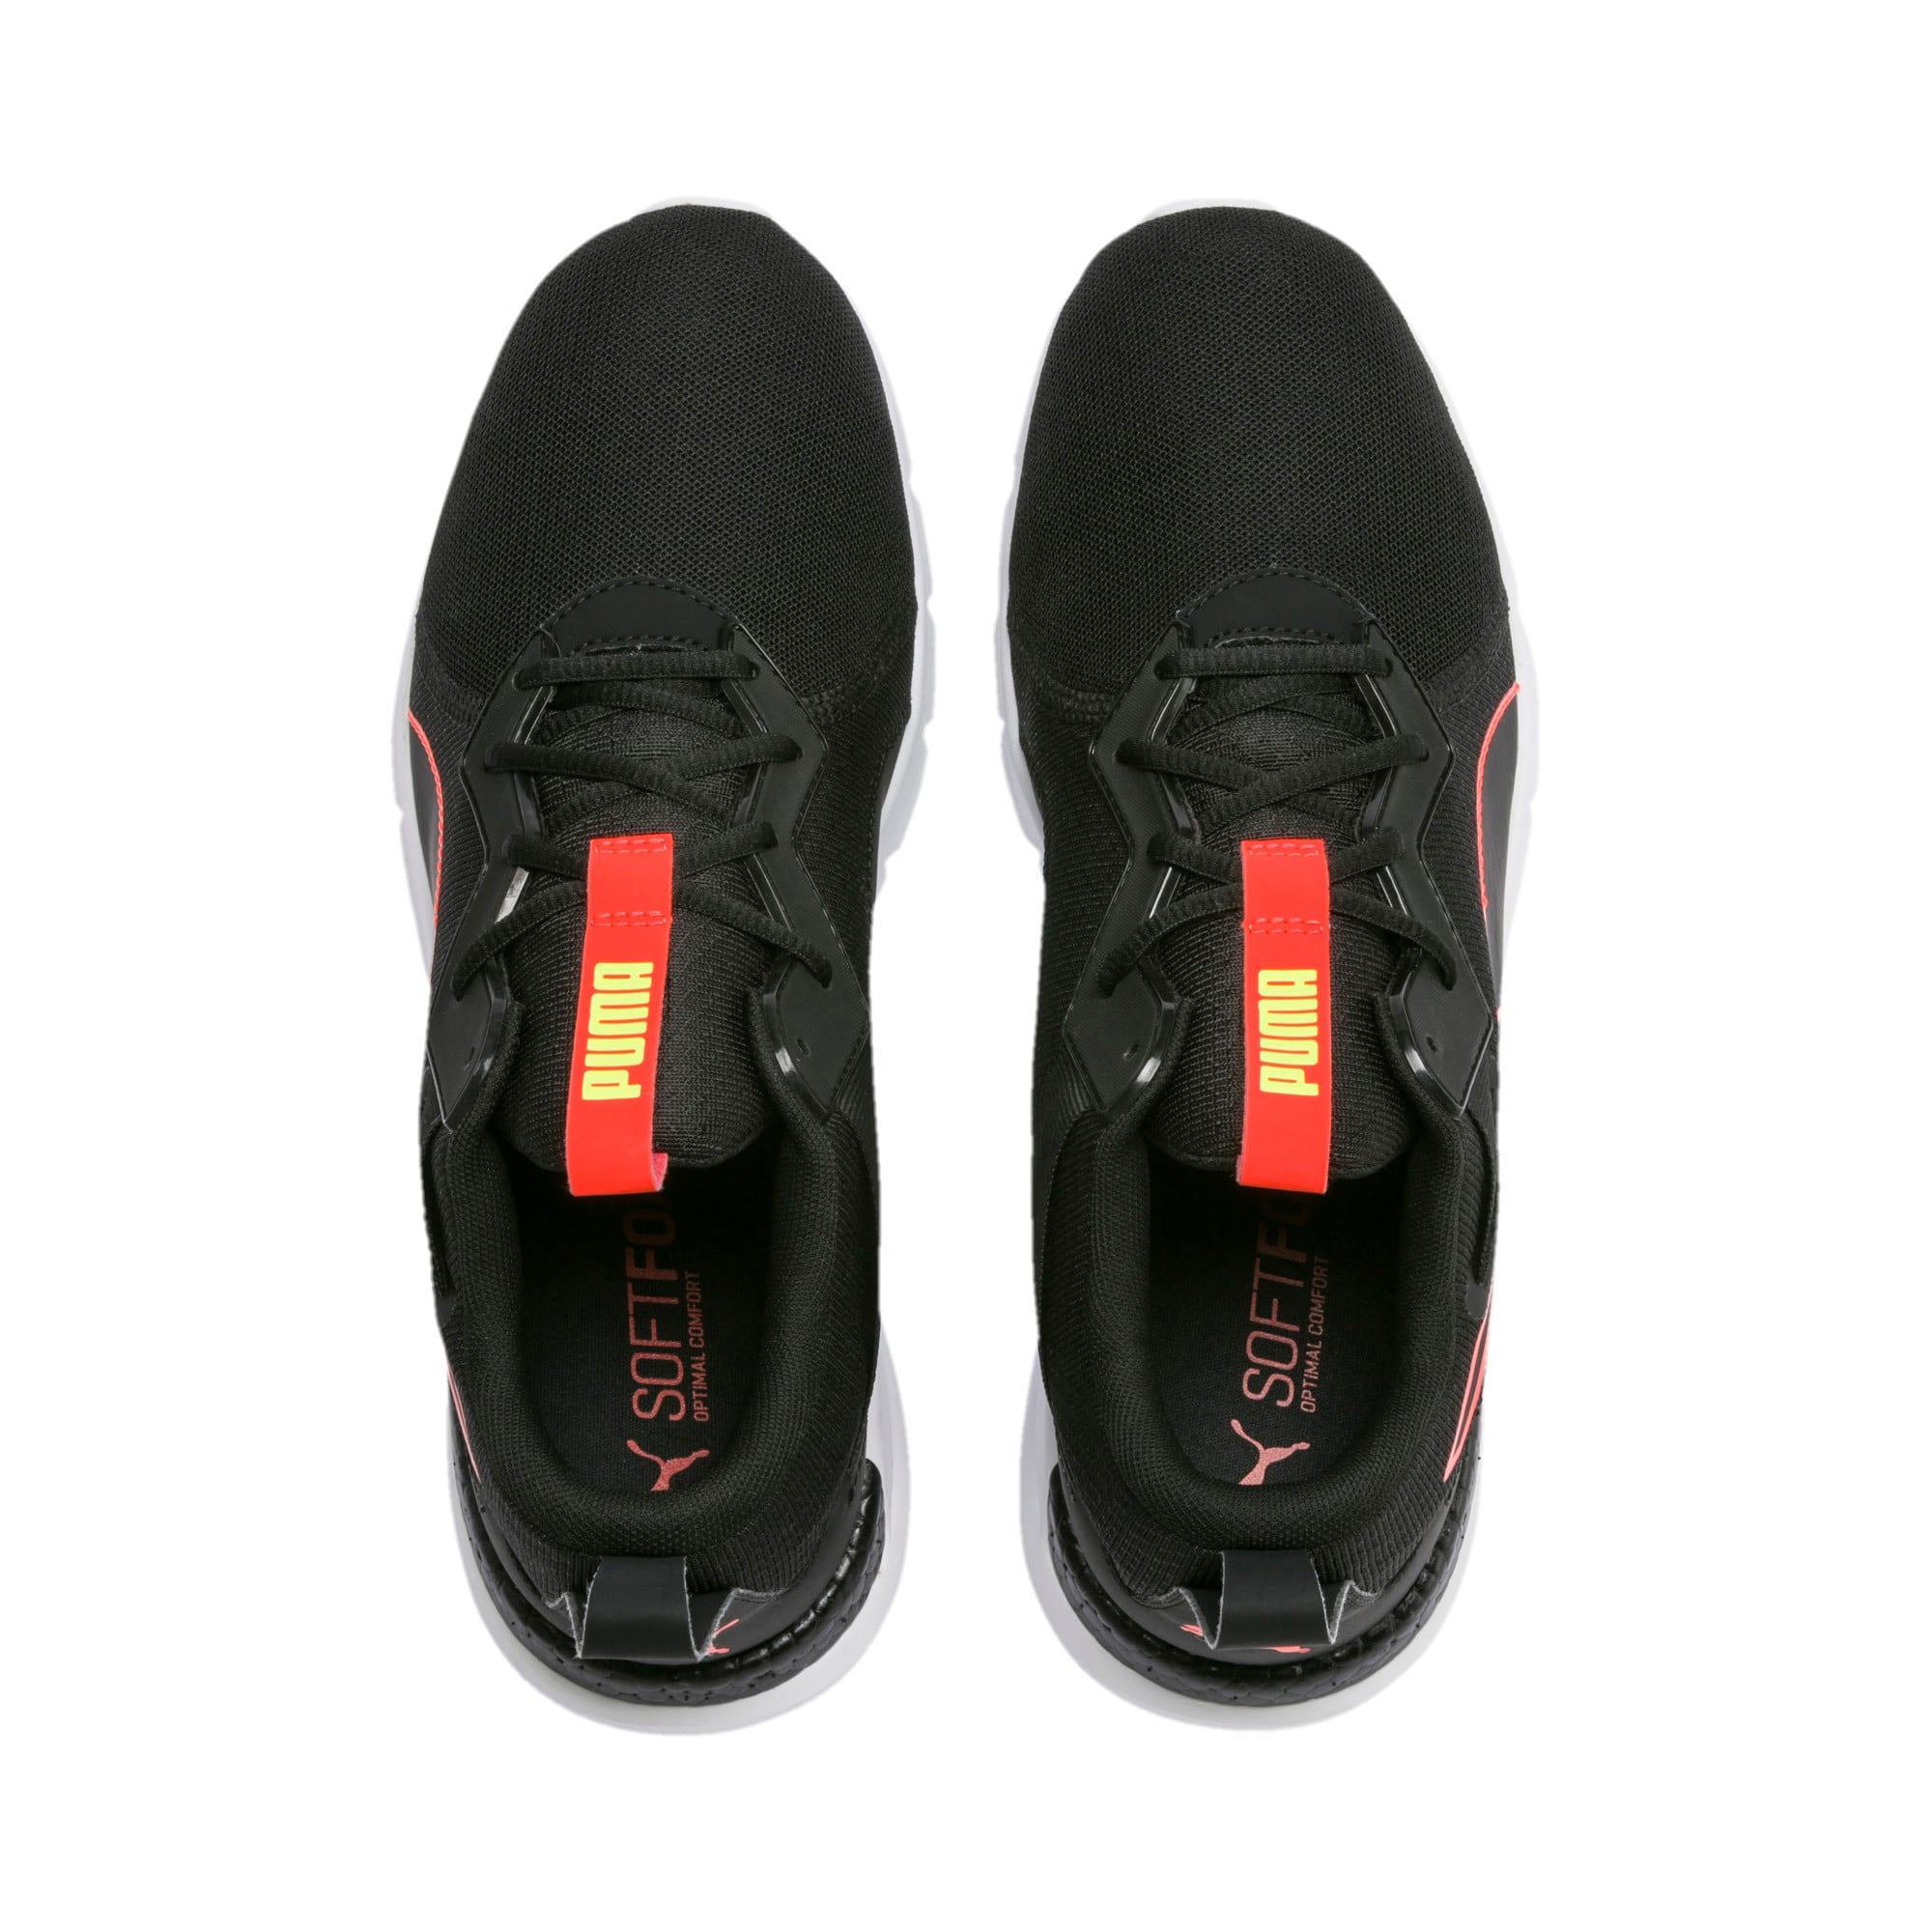 Thumbnail 7 of NRGY Dynamo Futuro Men's Running Shoes, Puma Black-Nrgy Red, medium